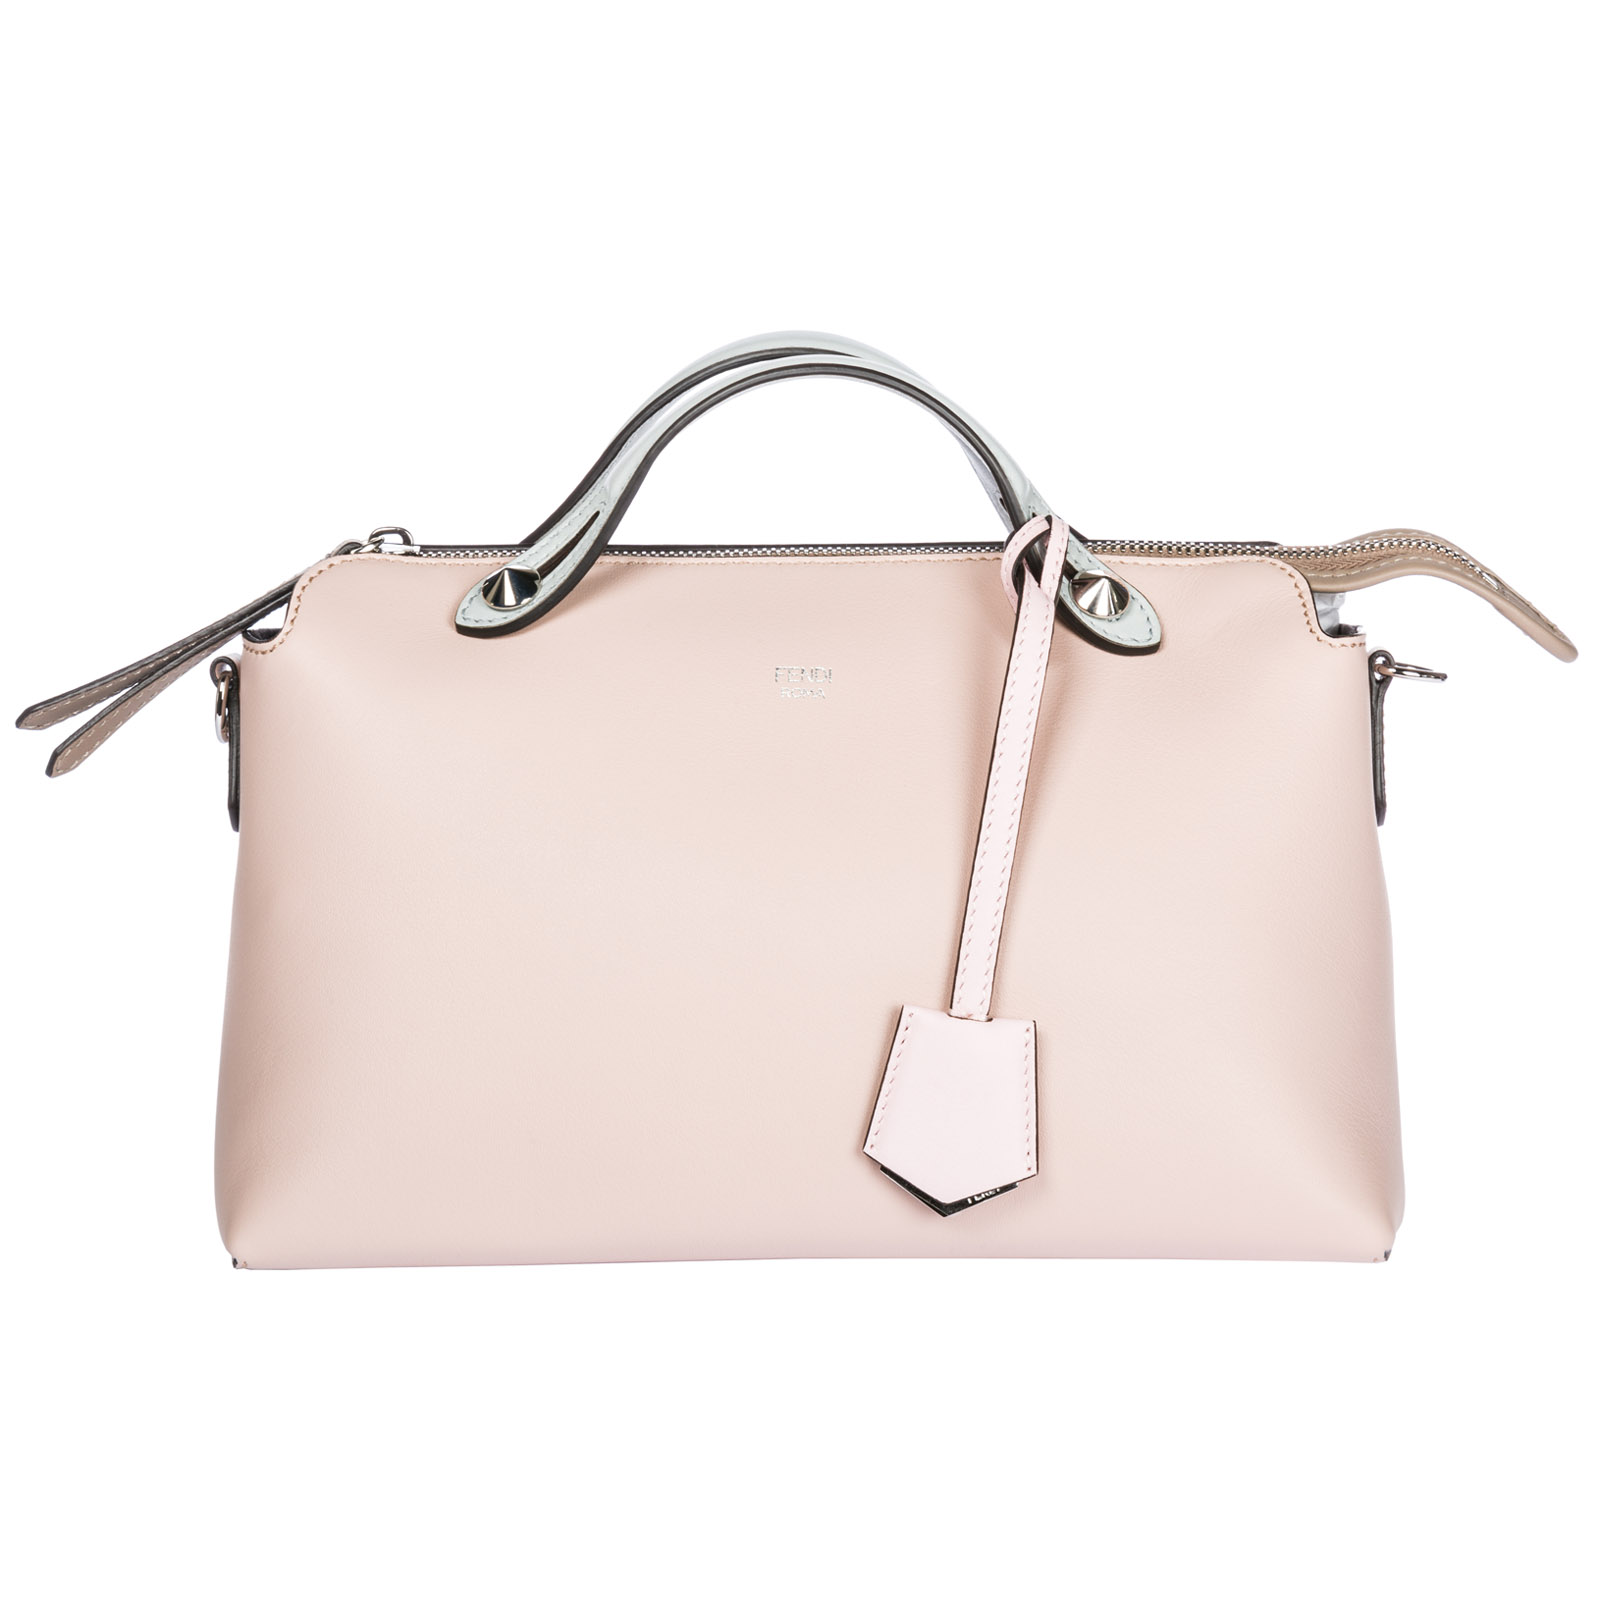 770958b8f4c9 Fendi Women S Leather Handbag Barrel Bag Purse By The Way Regular In Pink